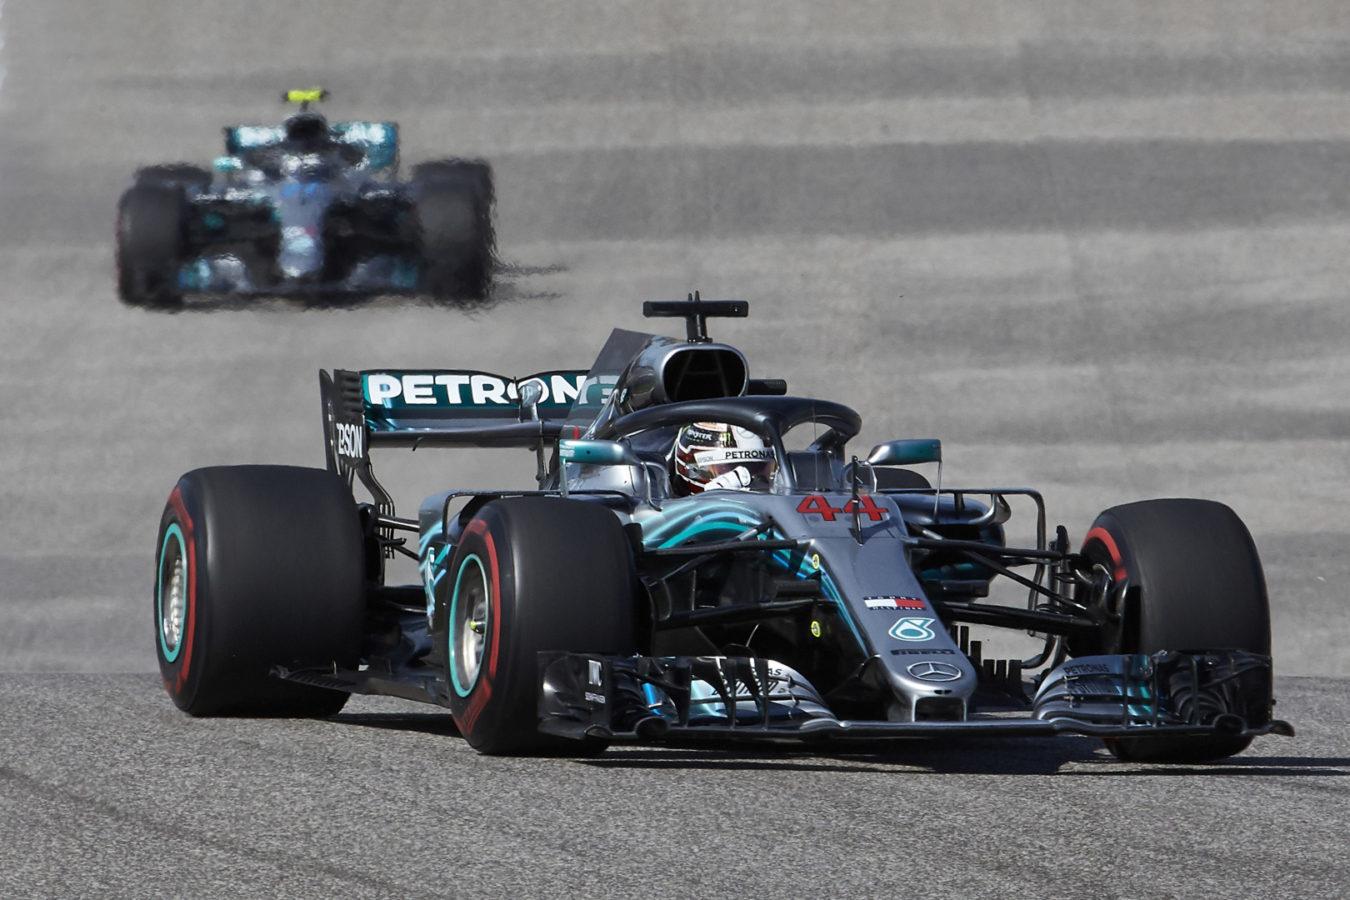 Formel 1 Austin 2019